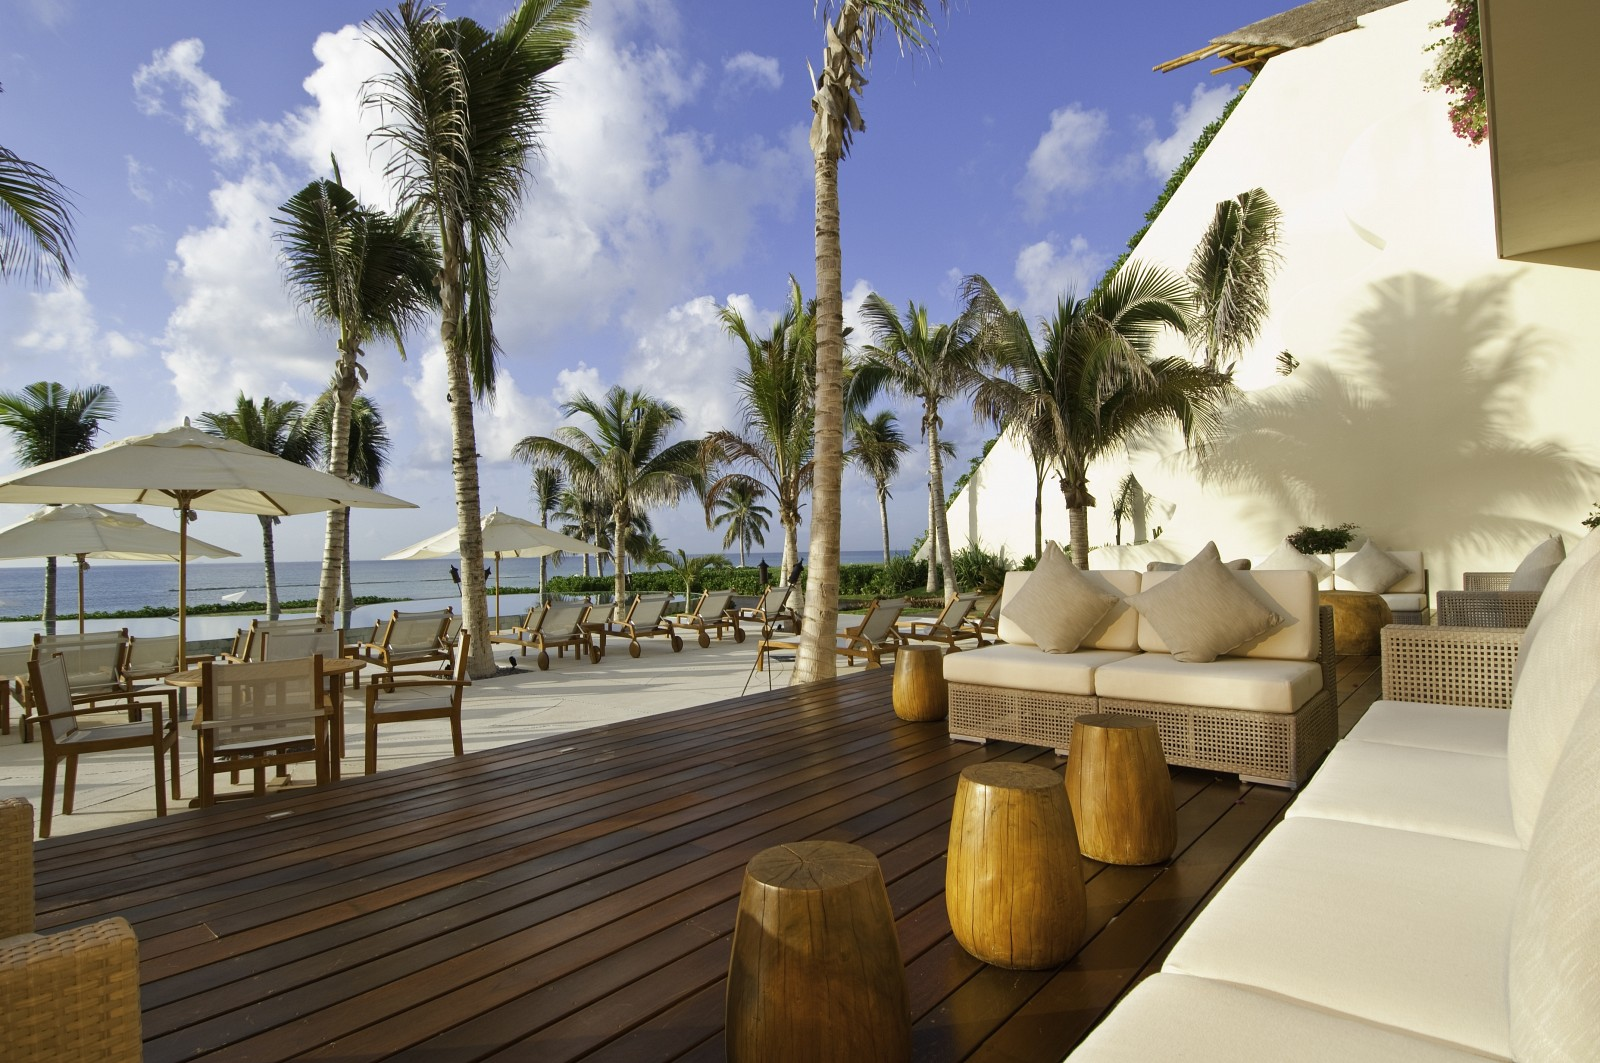 Travel Agency All-Inclusive Resort Grand Velas Riviera Maya 054